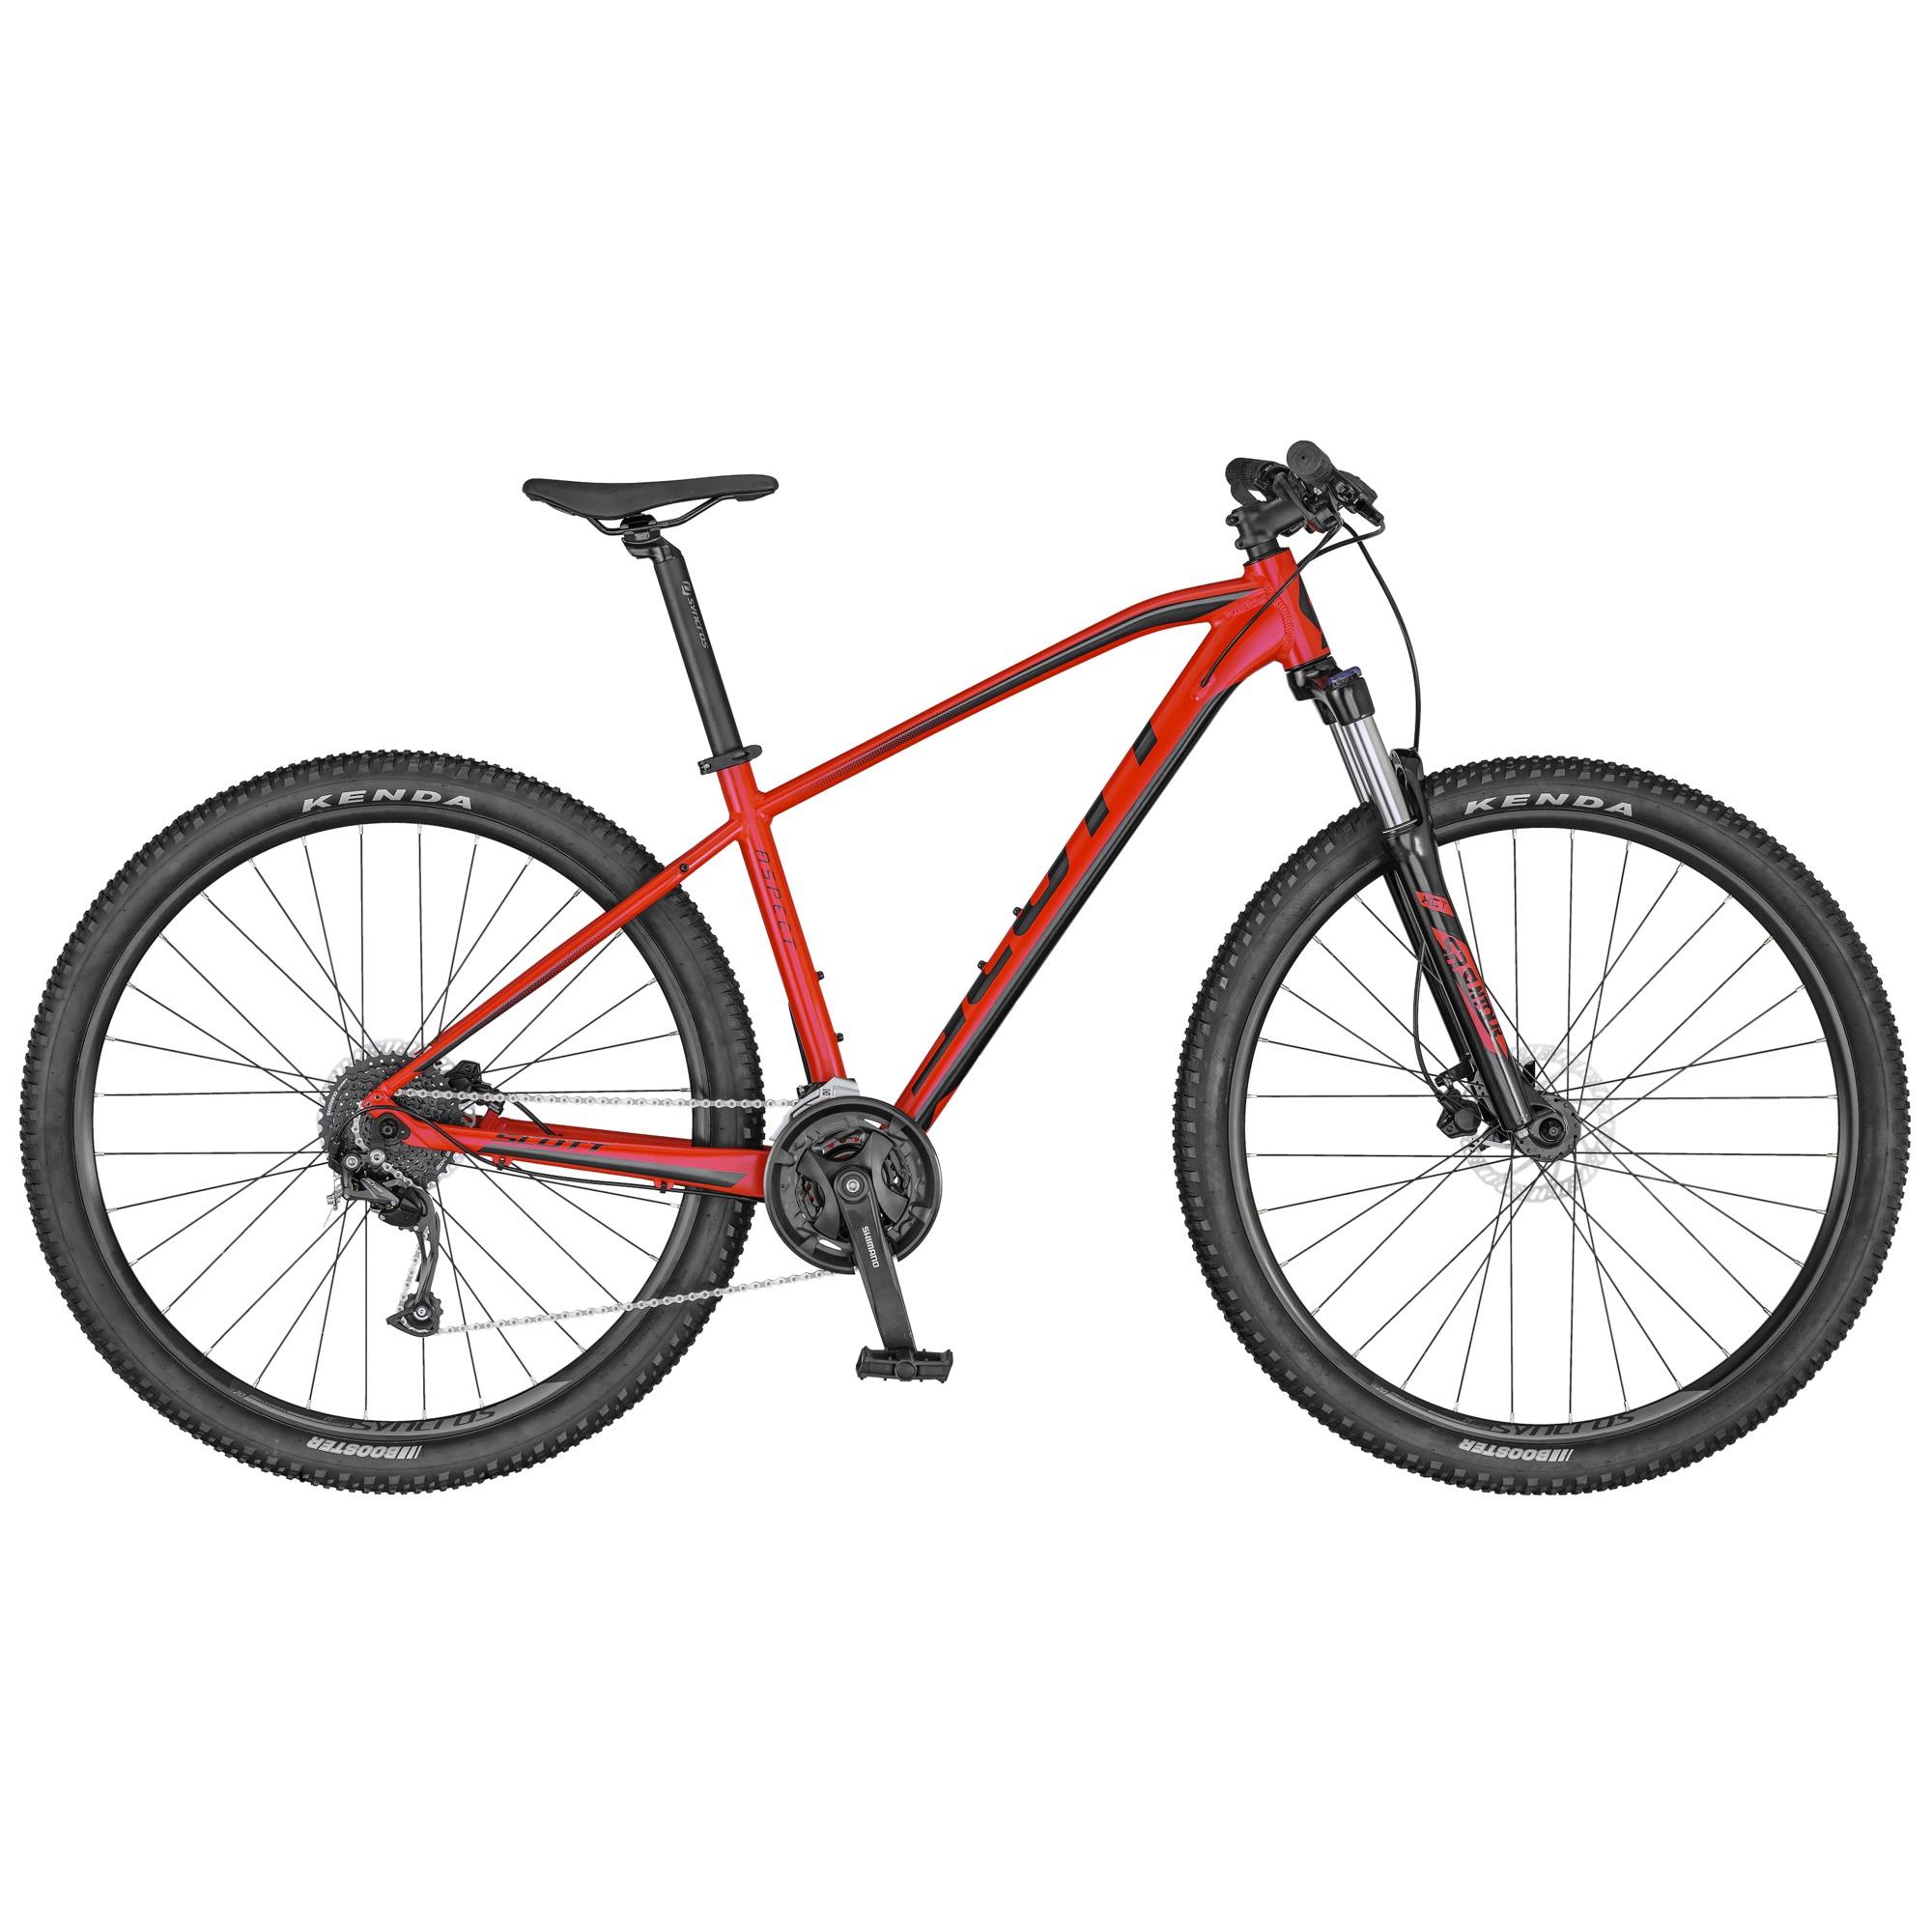 Scott Aspect 950 29″ Mountain Bike 2020